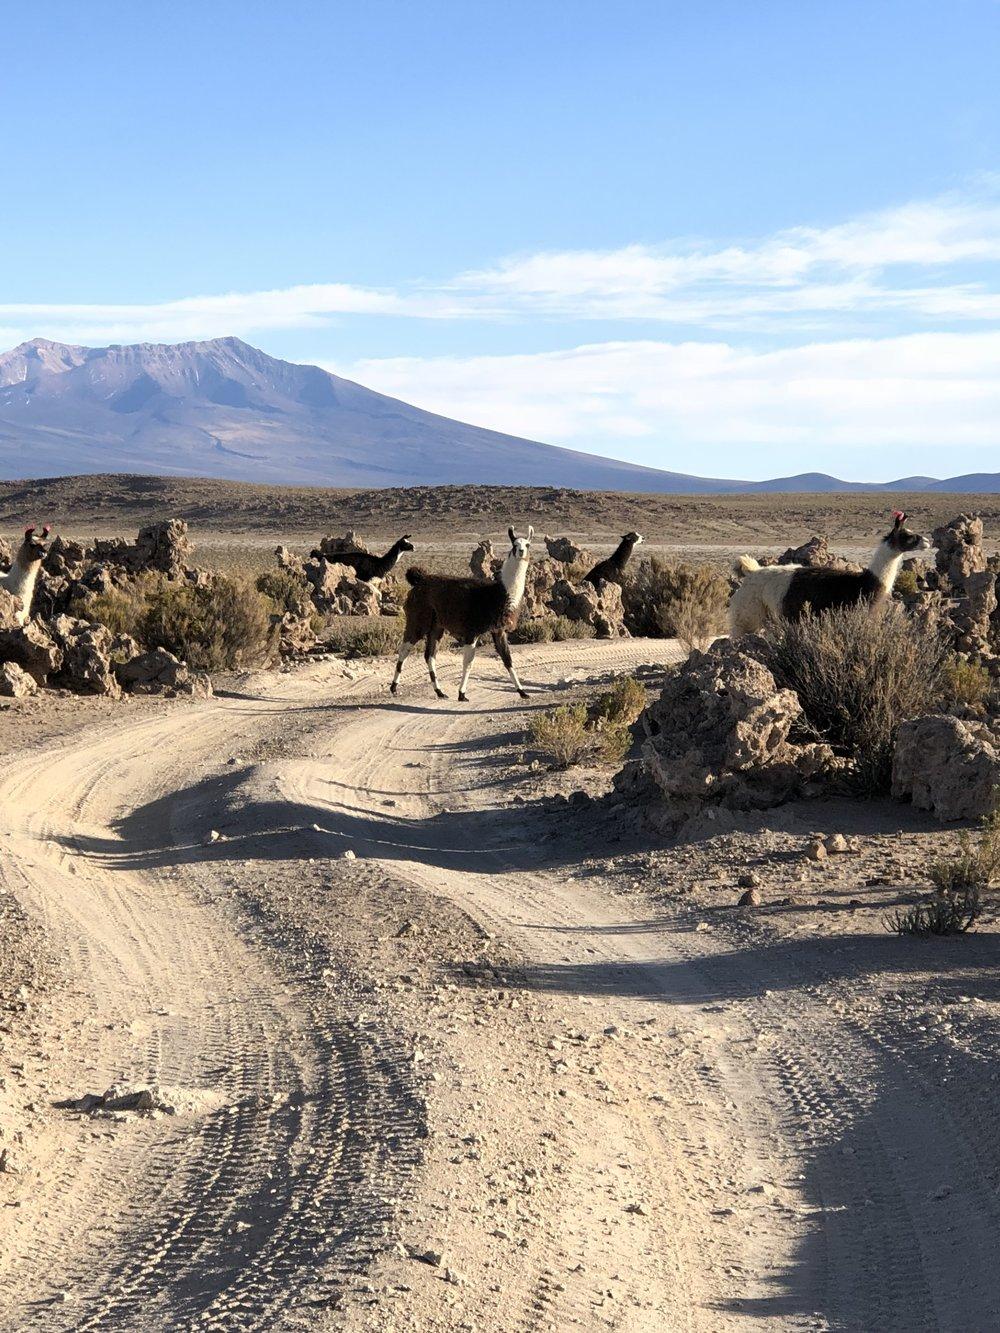 Llamas crossing amongst the coral.